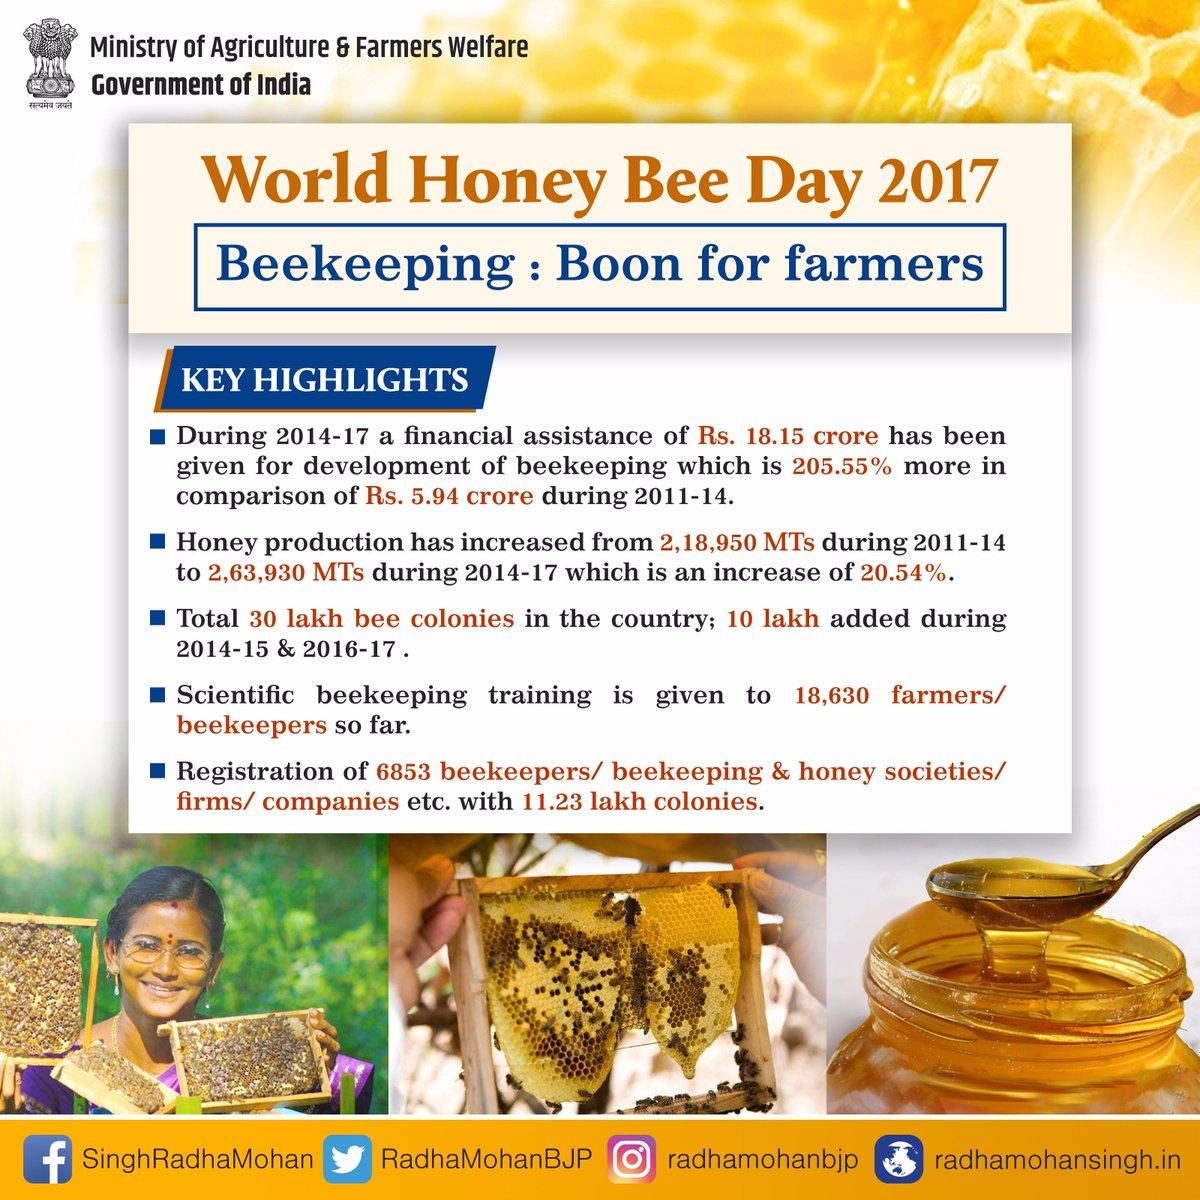 #Beekeeping : Boon for farmers #WorldHoneyBeeDay https://t.co/daDKBQFu...